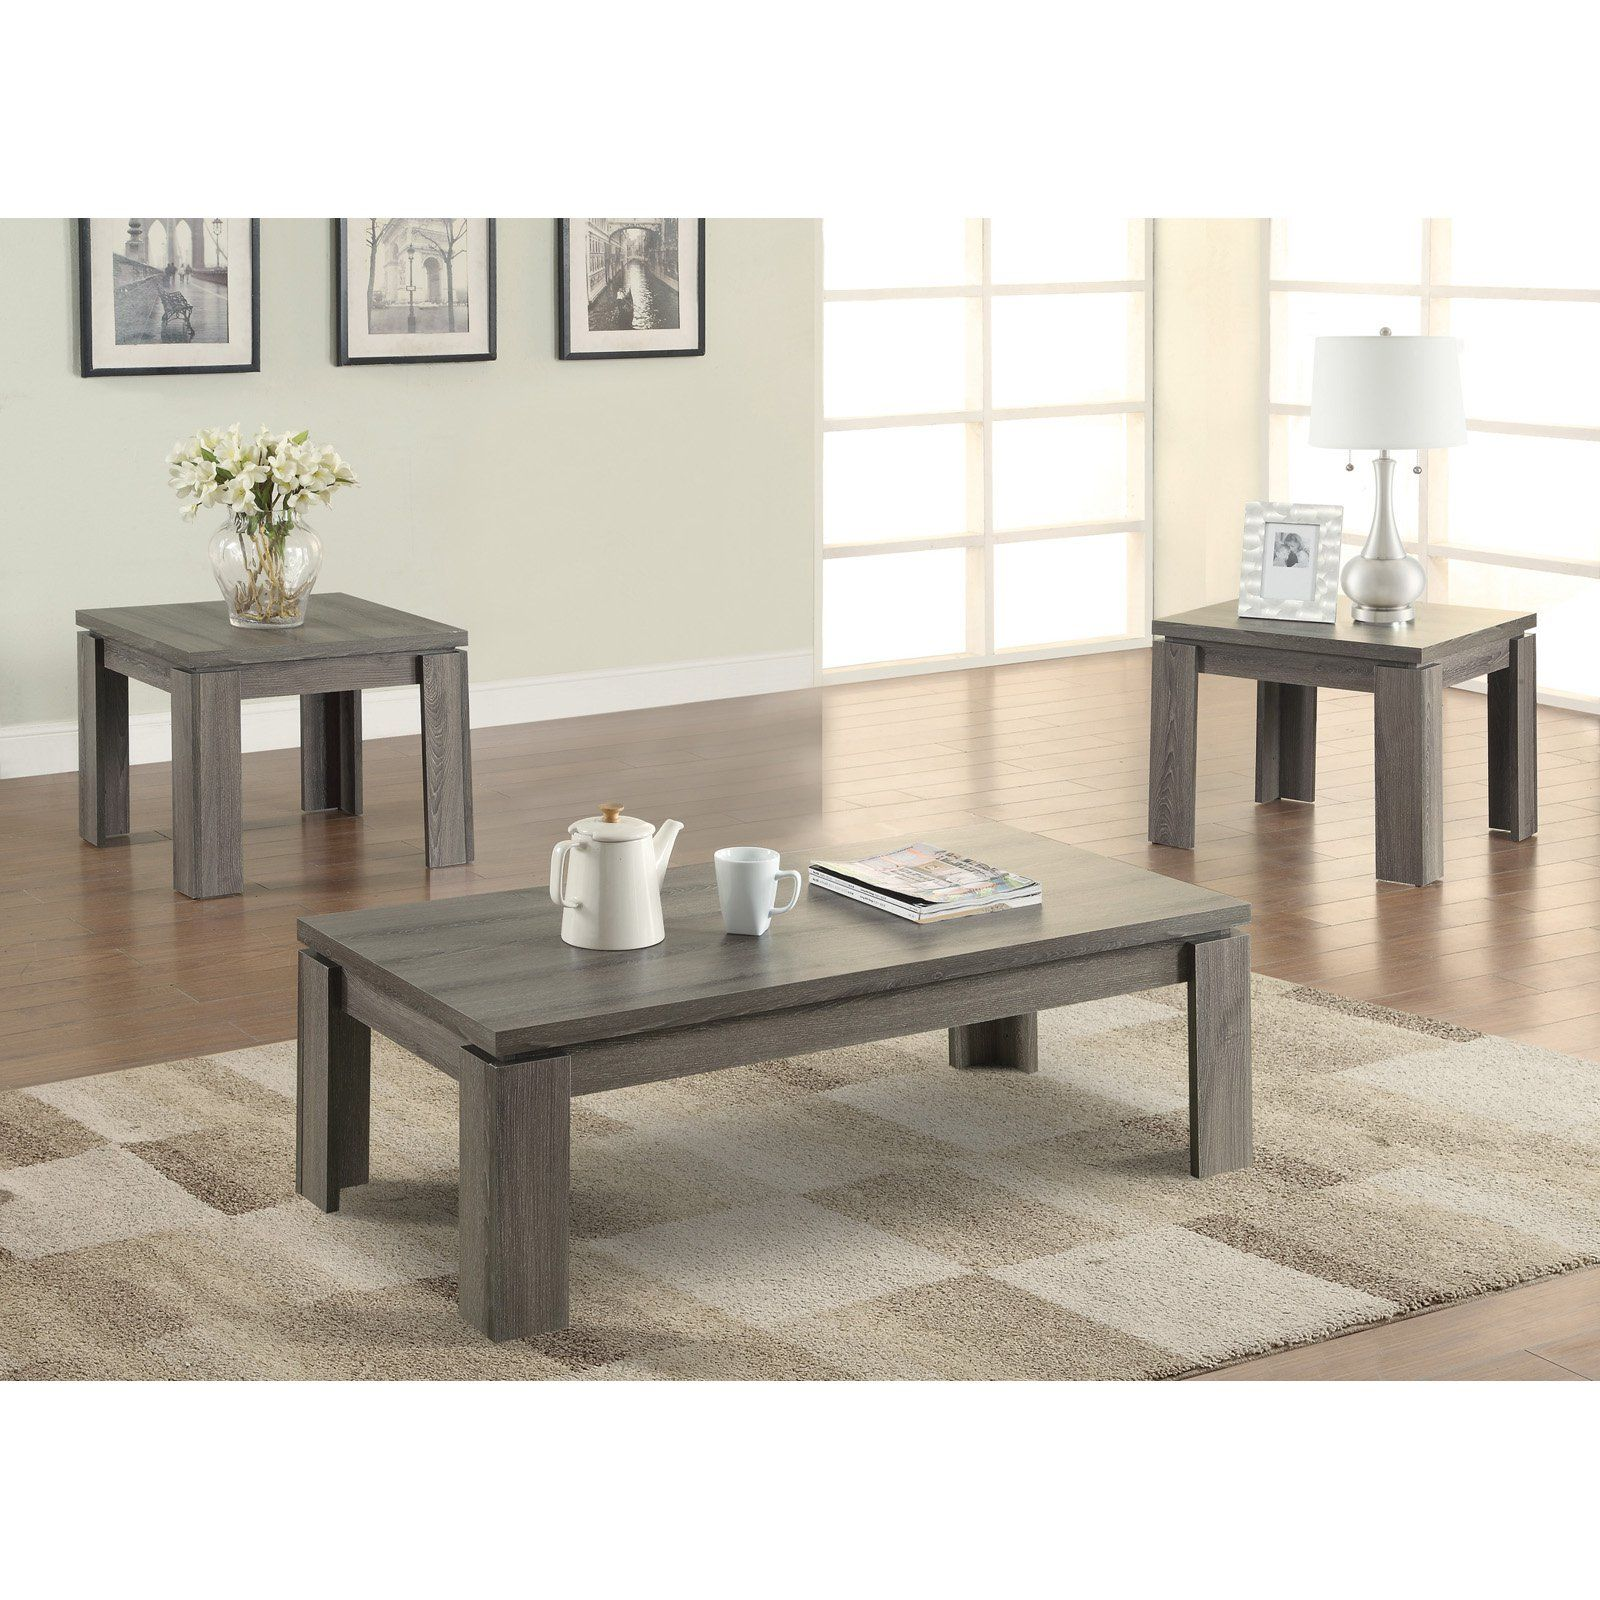 Coaster Furniture 3 Piece Modern Coffee Table Set Modern Coffee